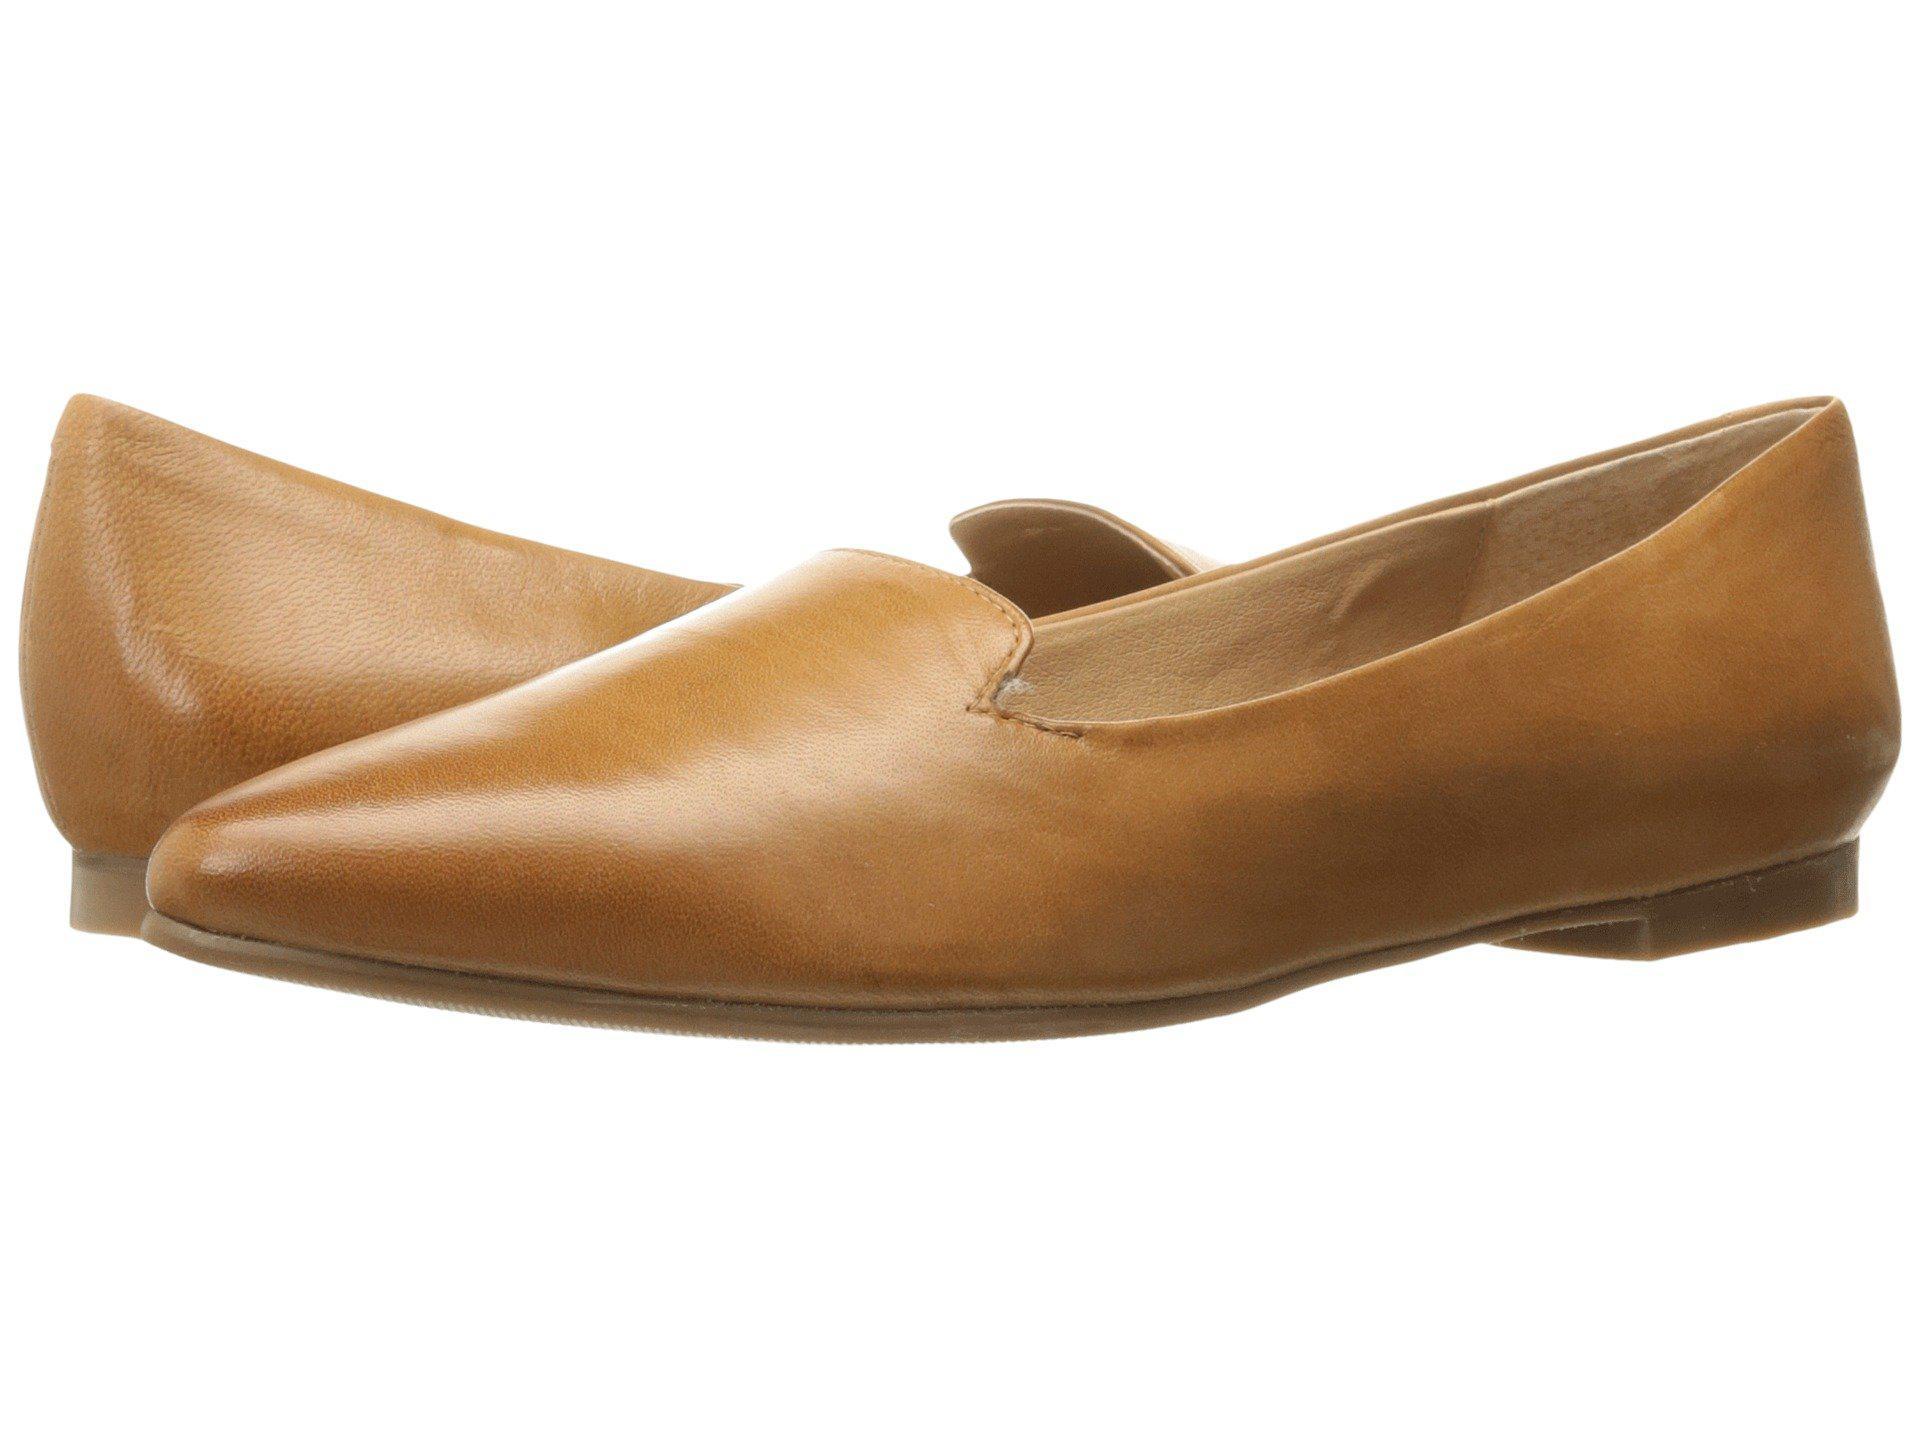 66ec9d85233 Lyst - Trotters Harlowe (Luggage) Women s Flat Shoes